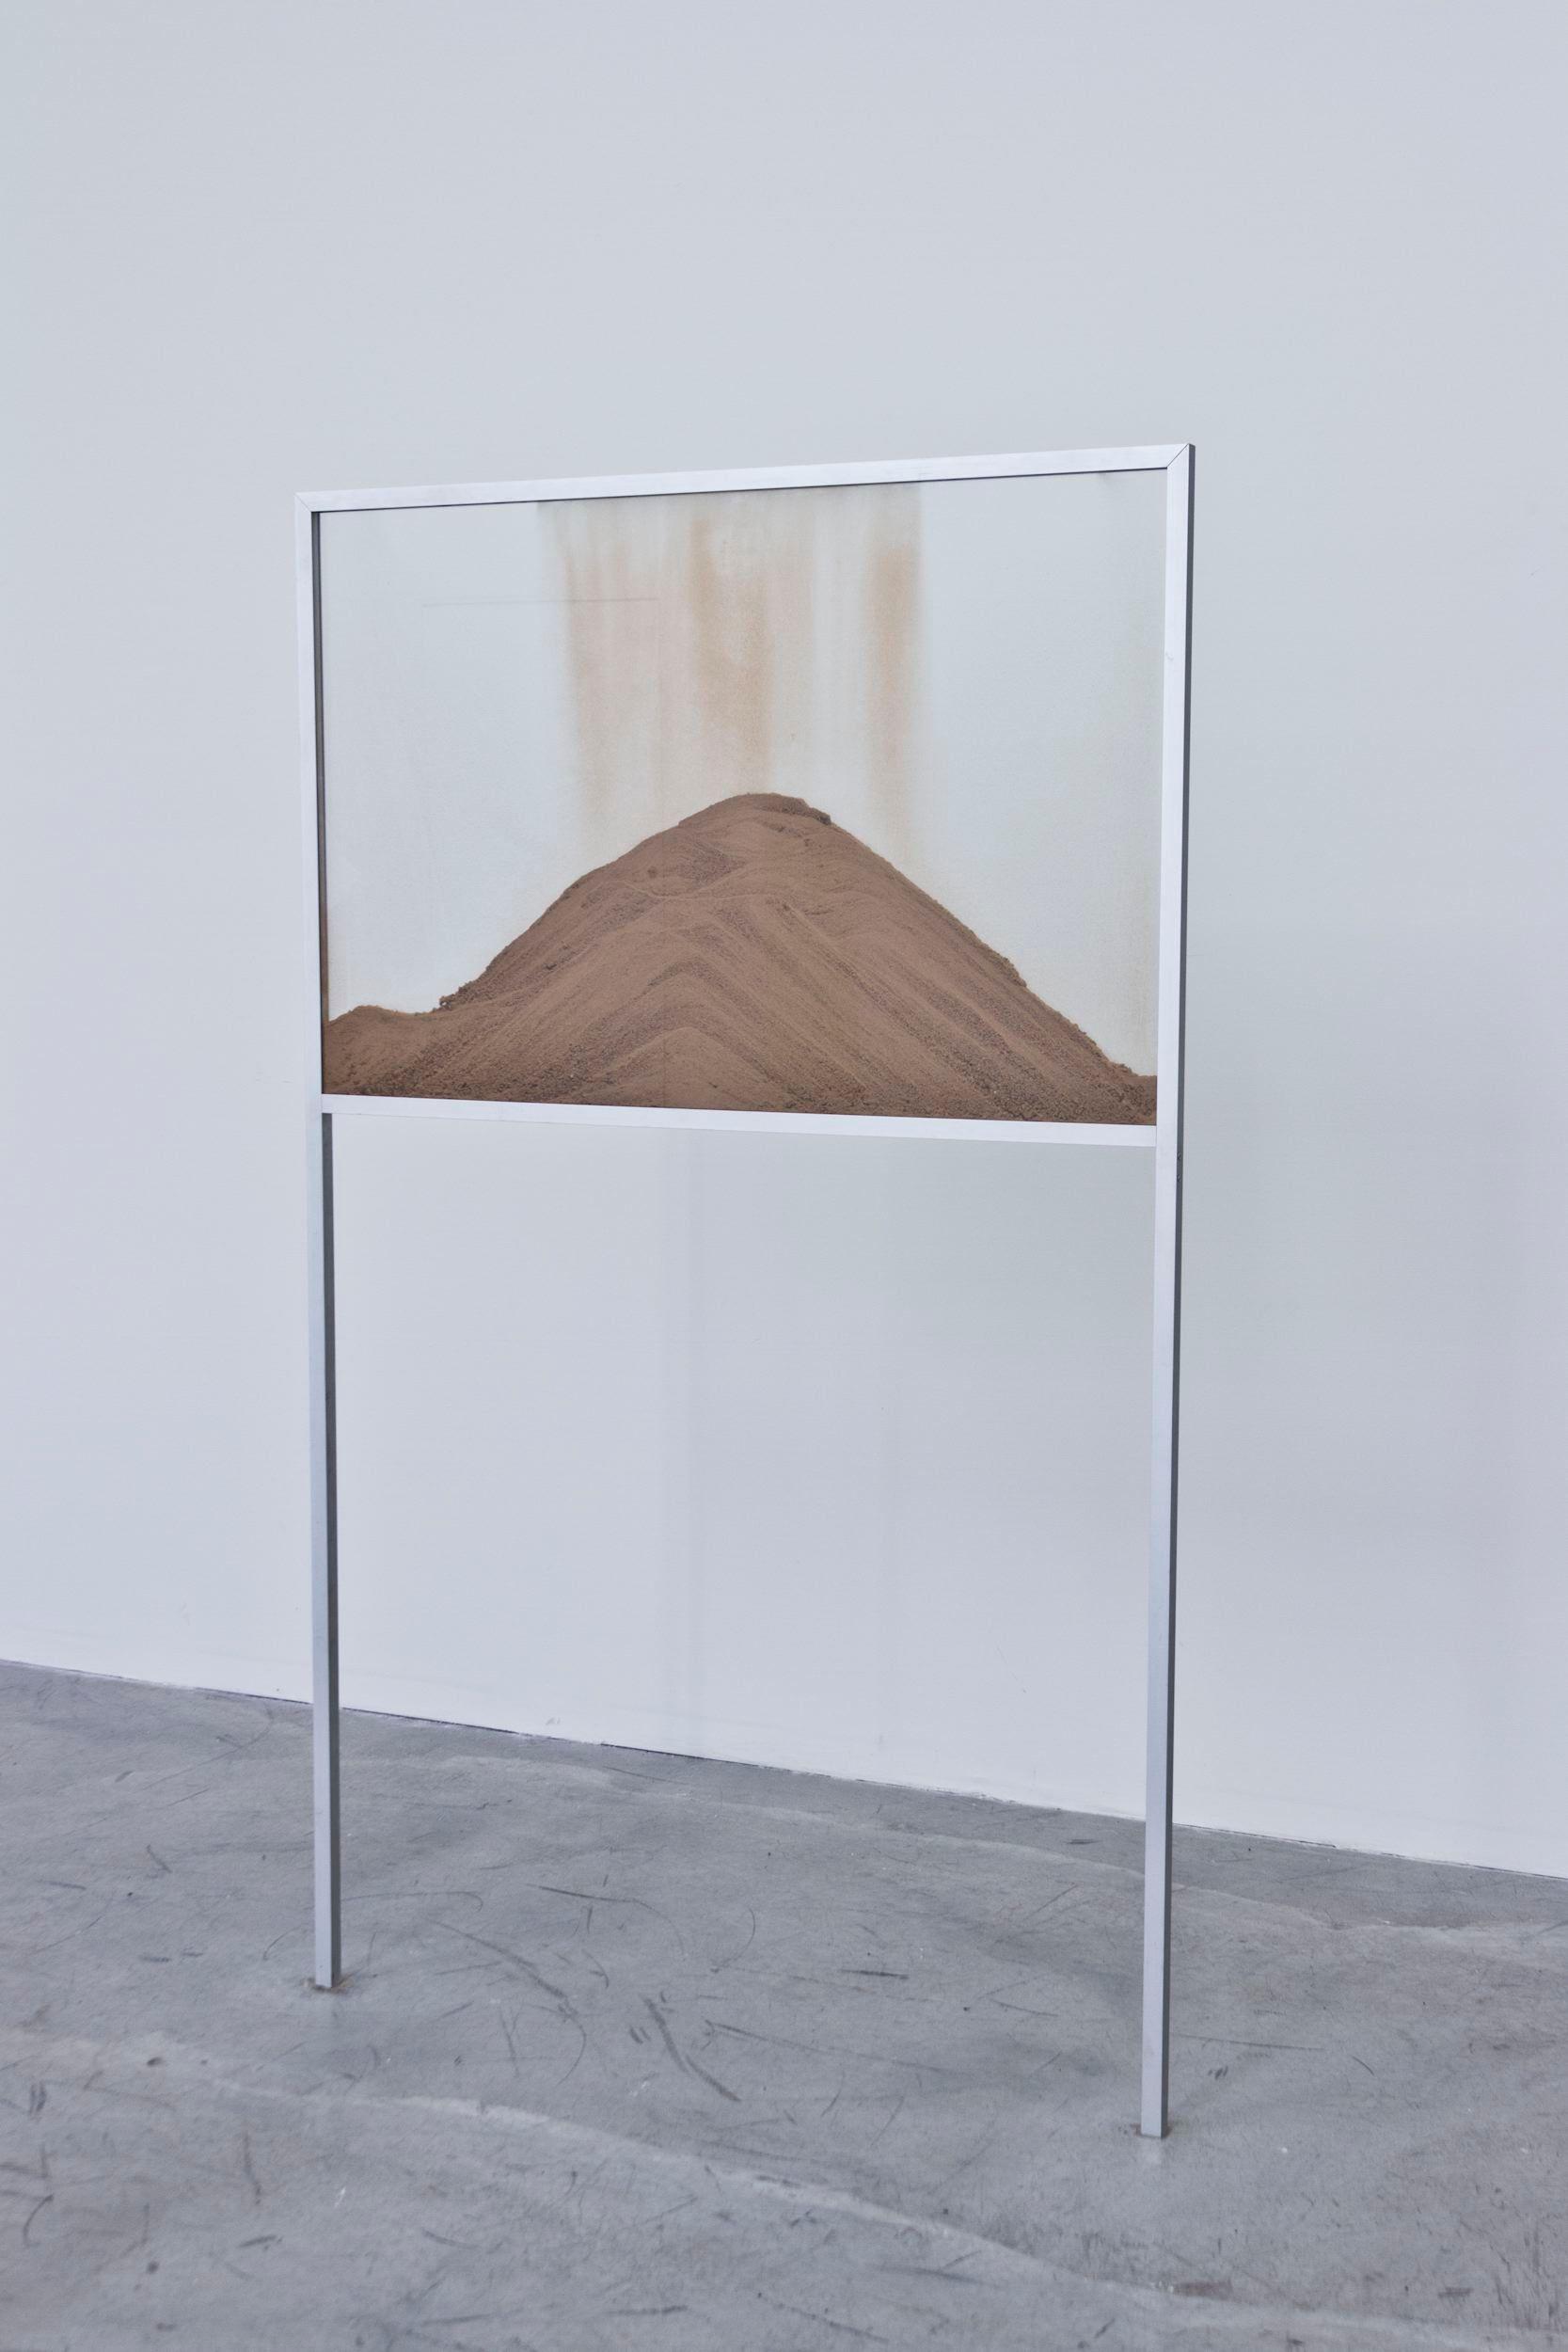 A World Undone [Protolith] | Zircone, glass, metal, film on HD colour, silent, loop | 150 x 90 x 3 cm | 2012